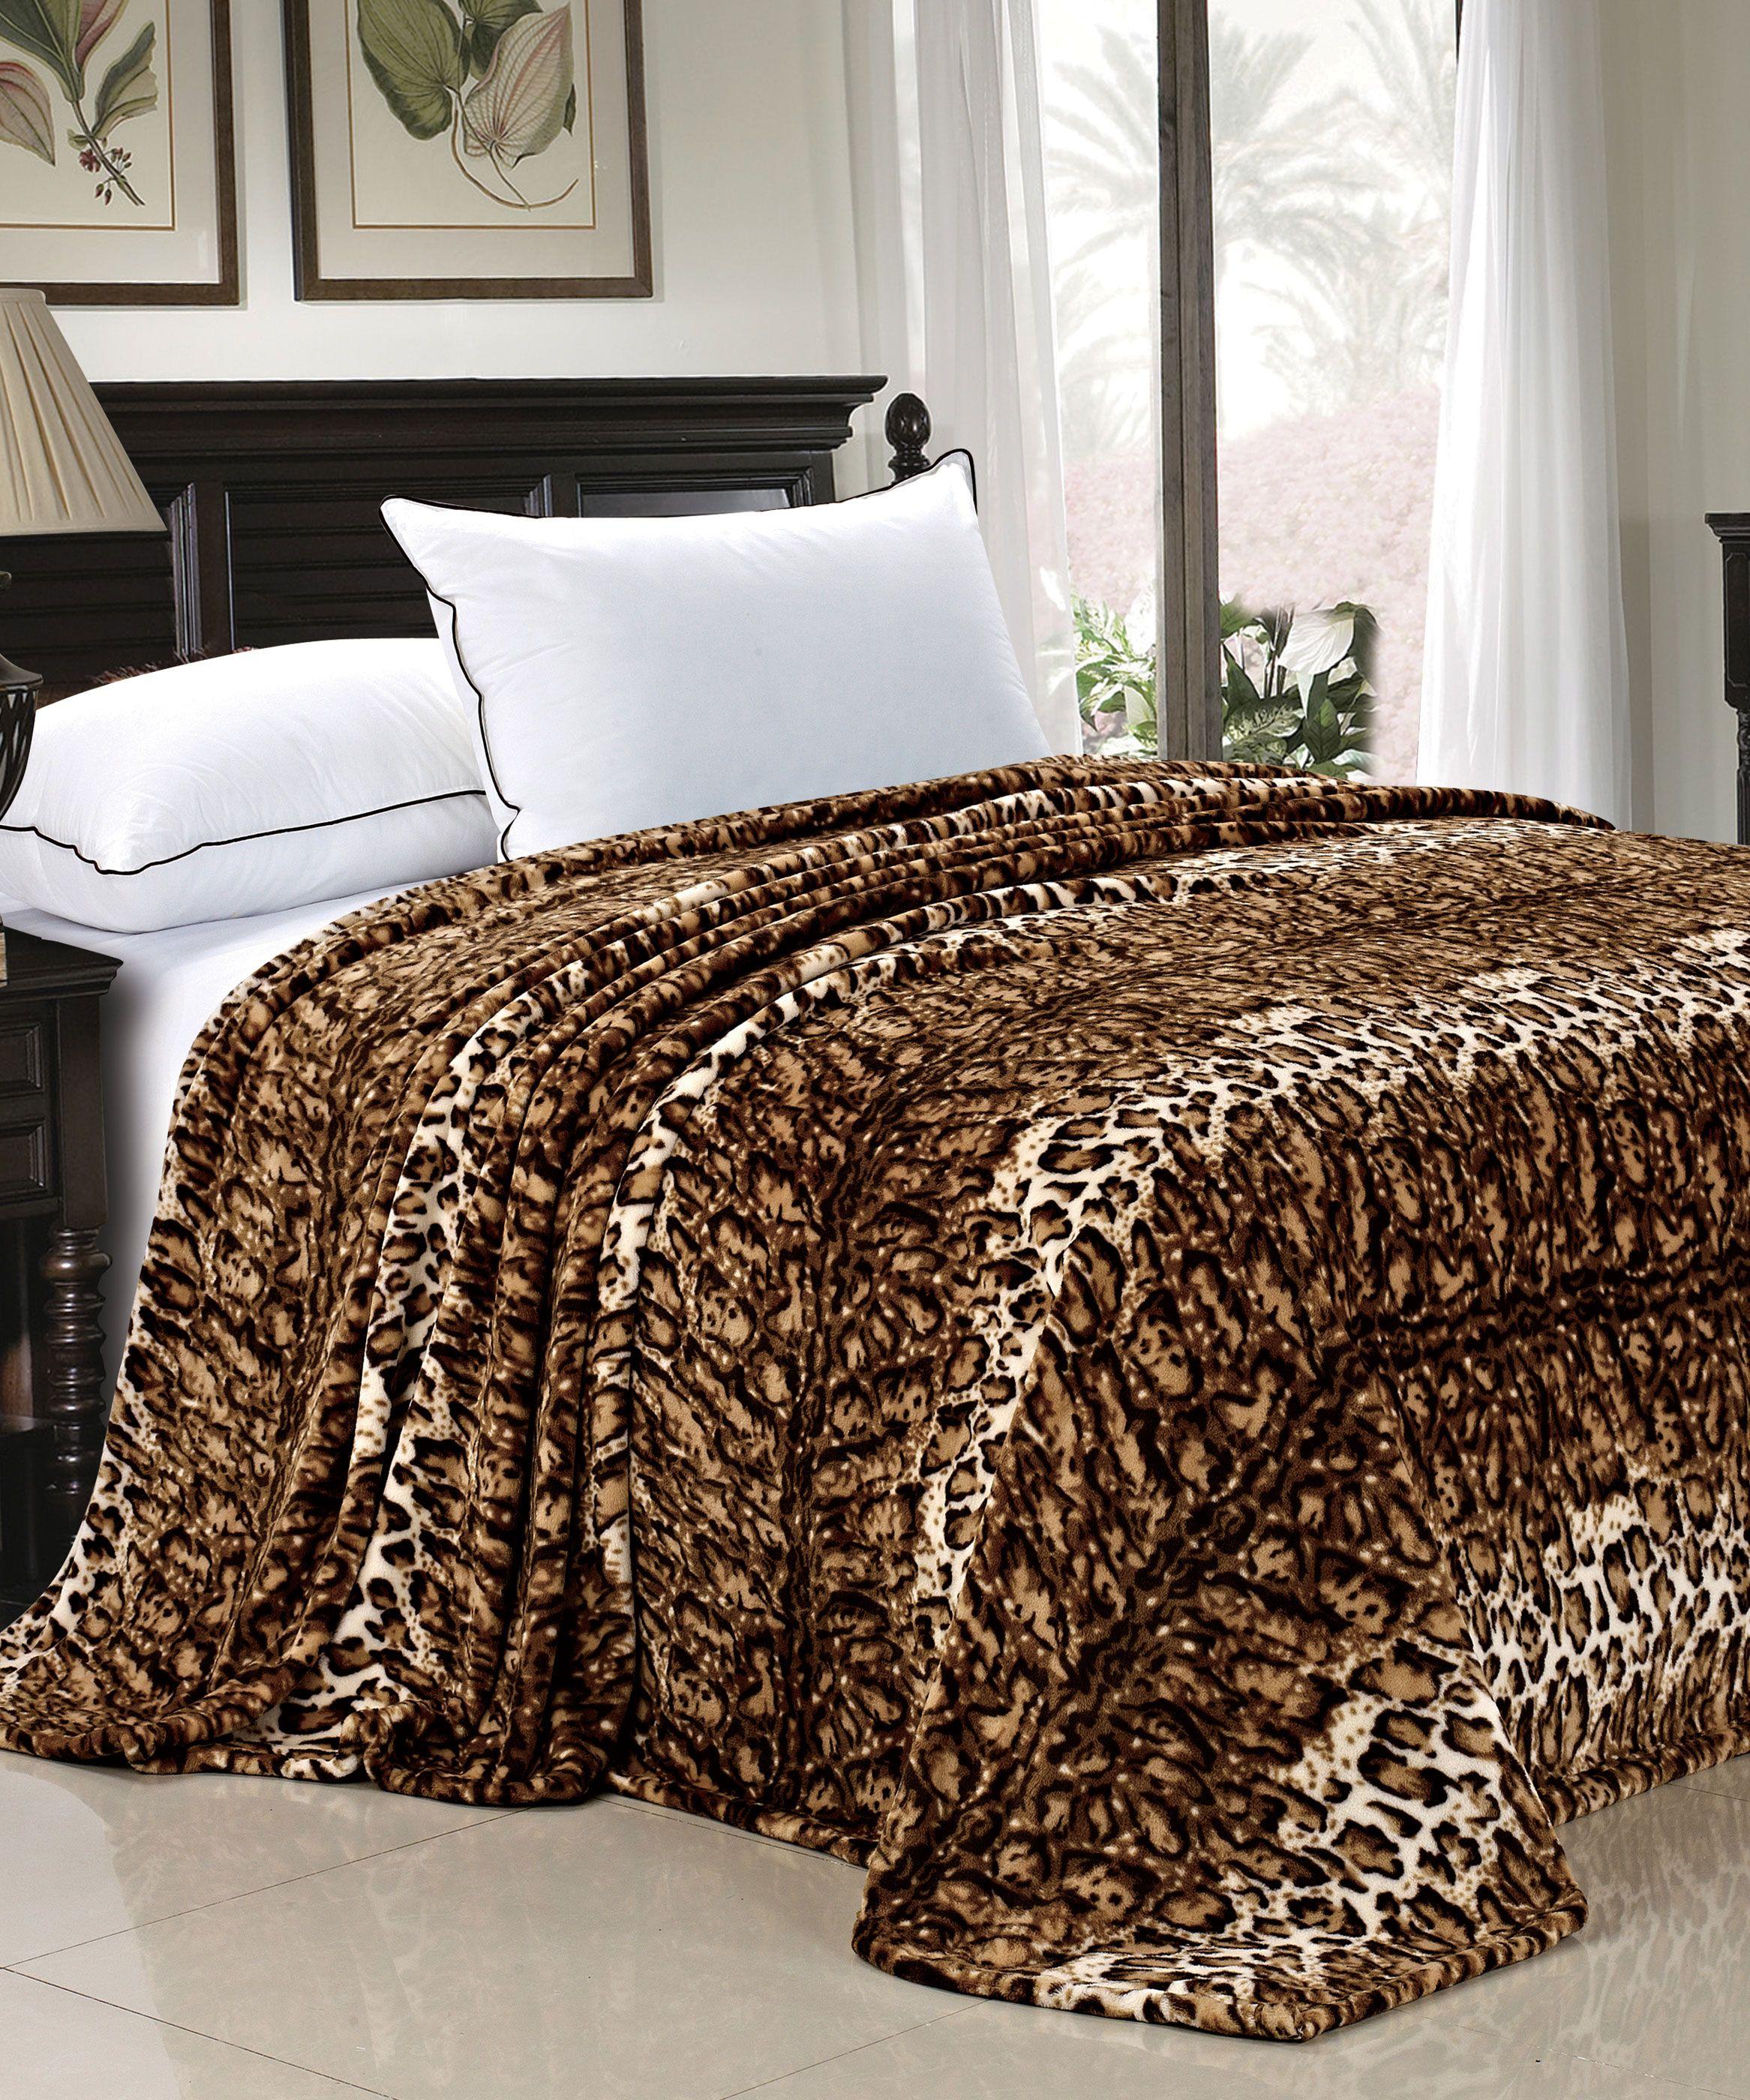 Natural leopard animal safari printed flannel fleece bed blanket